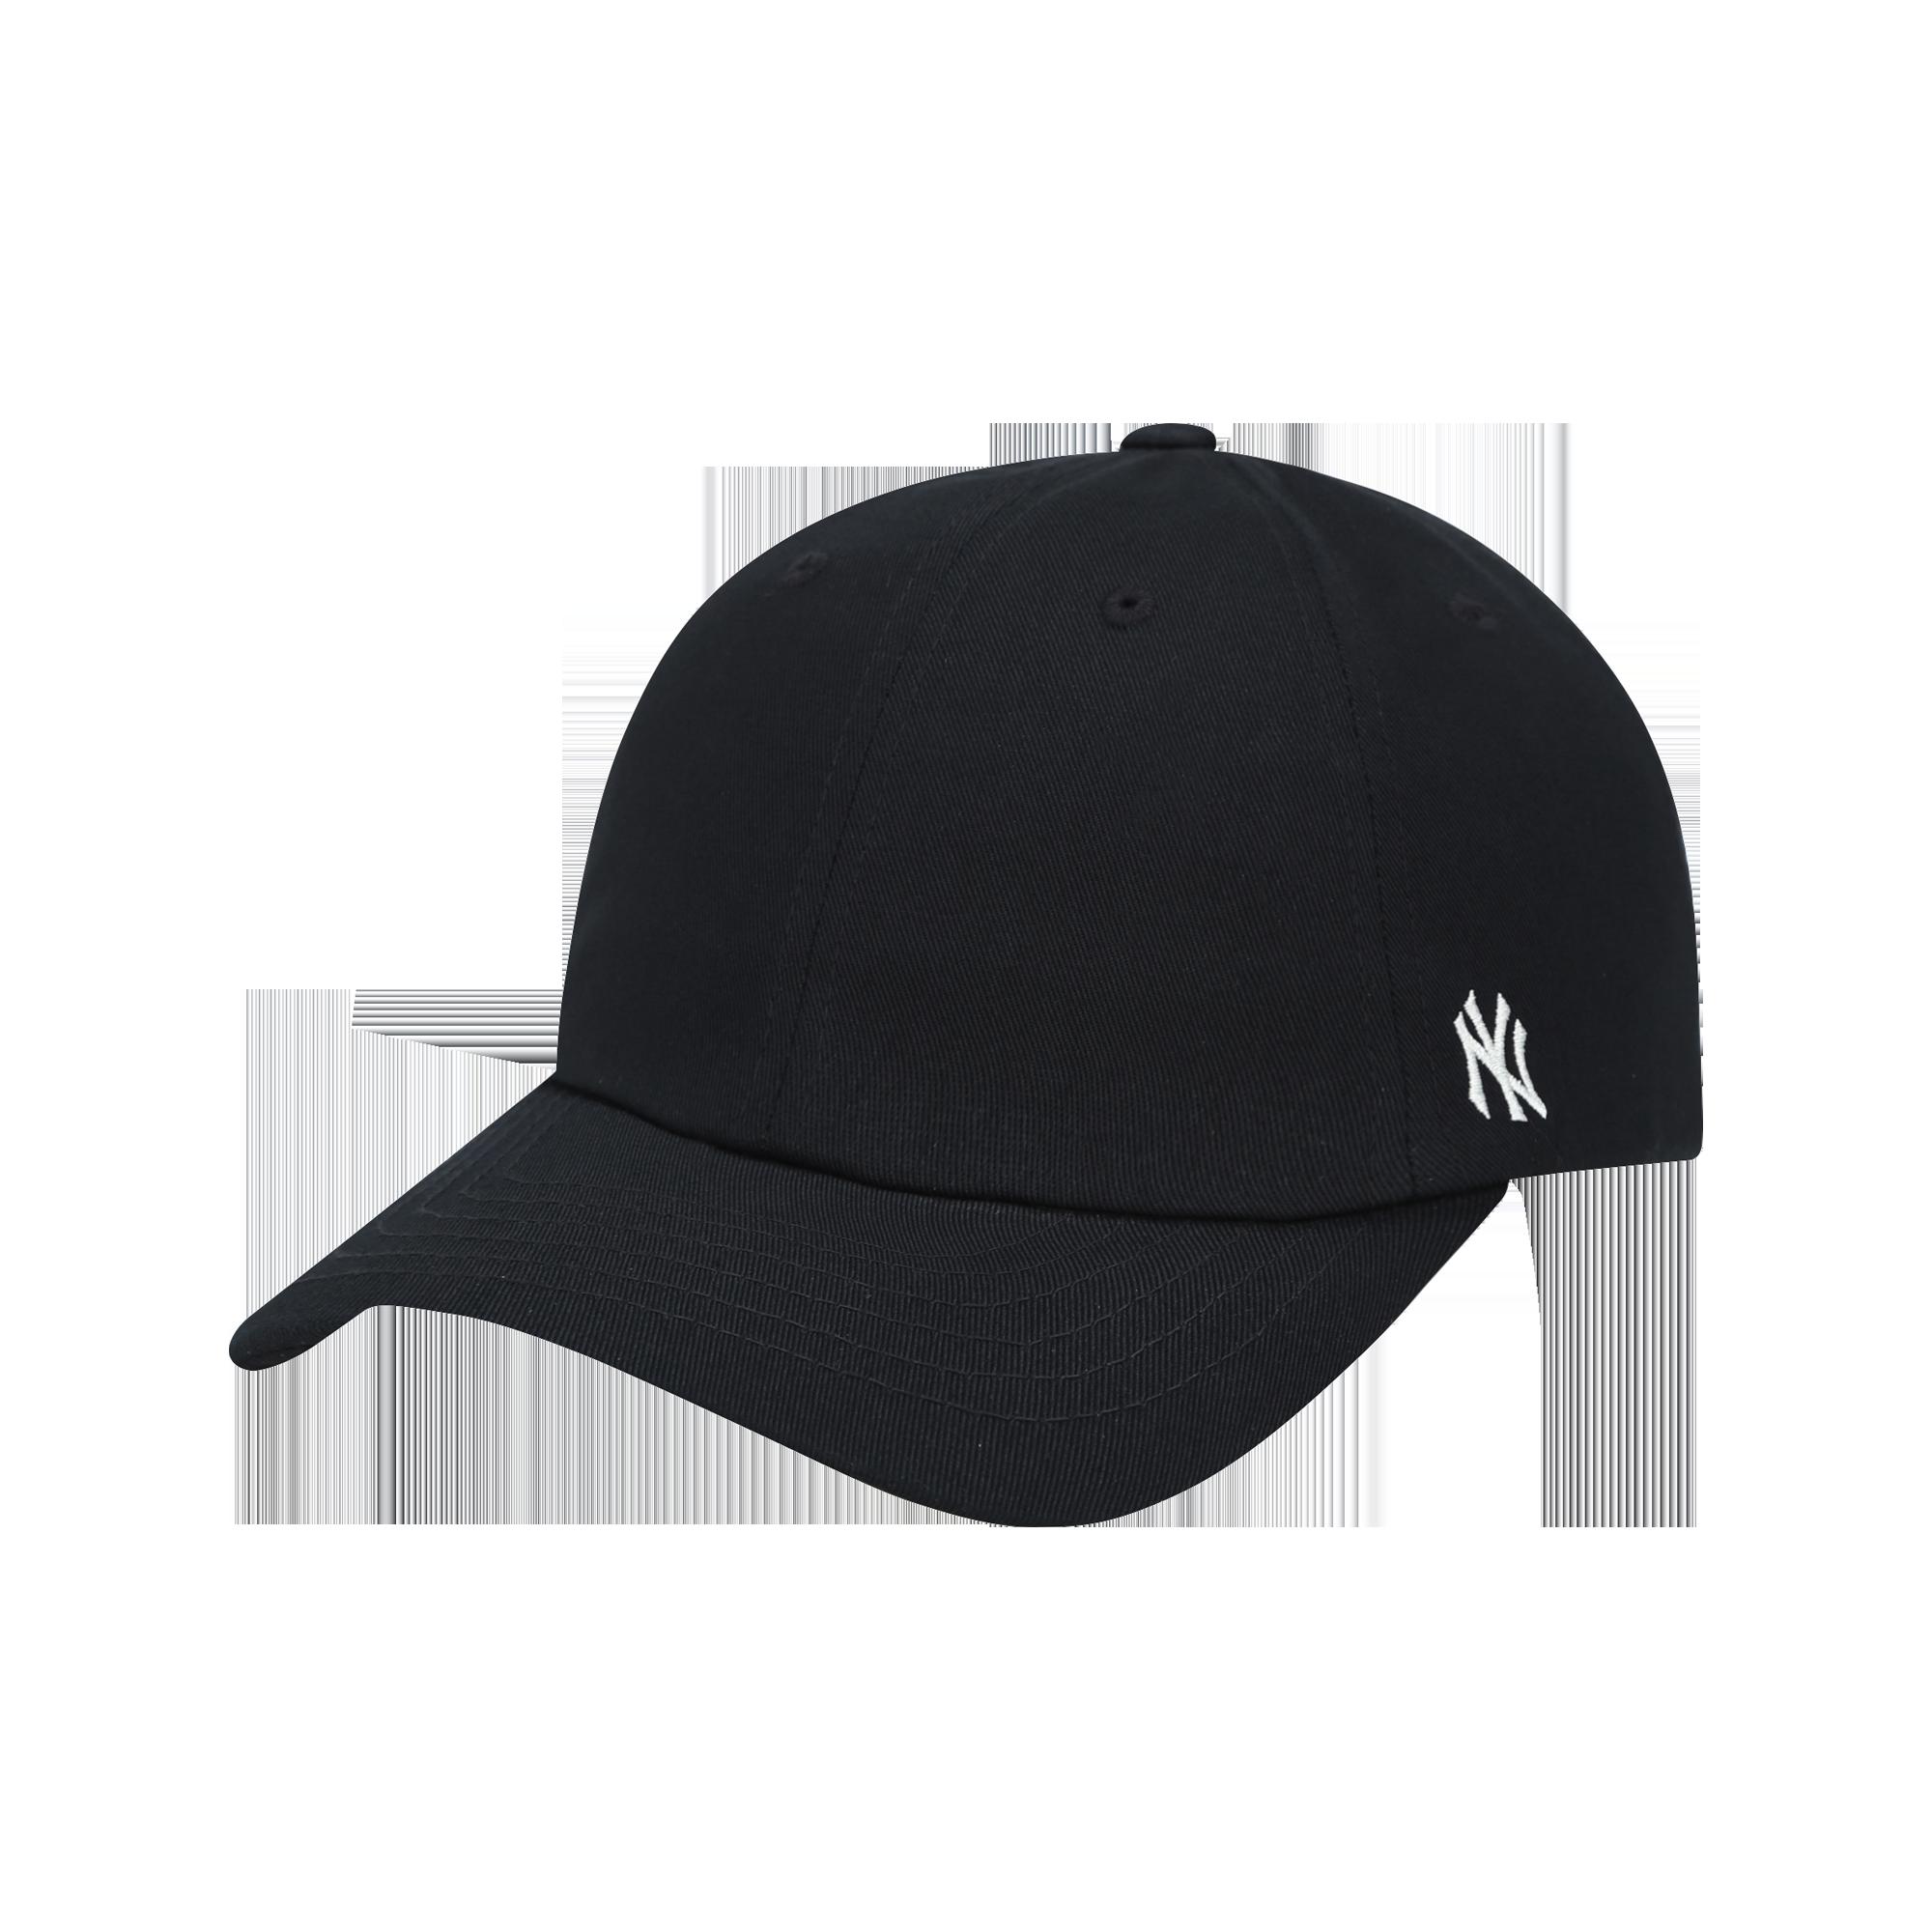 NEW YORK YANKEES BLANK BALL CAP